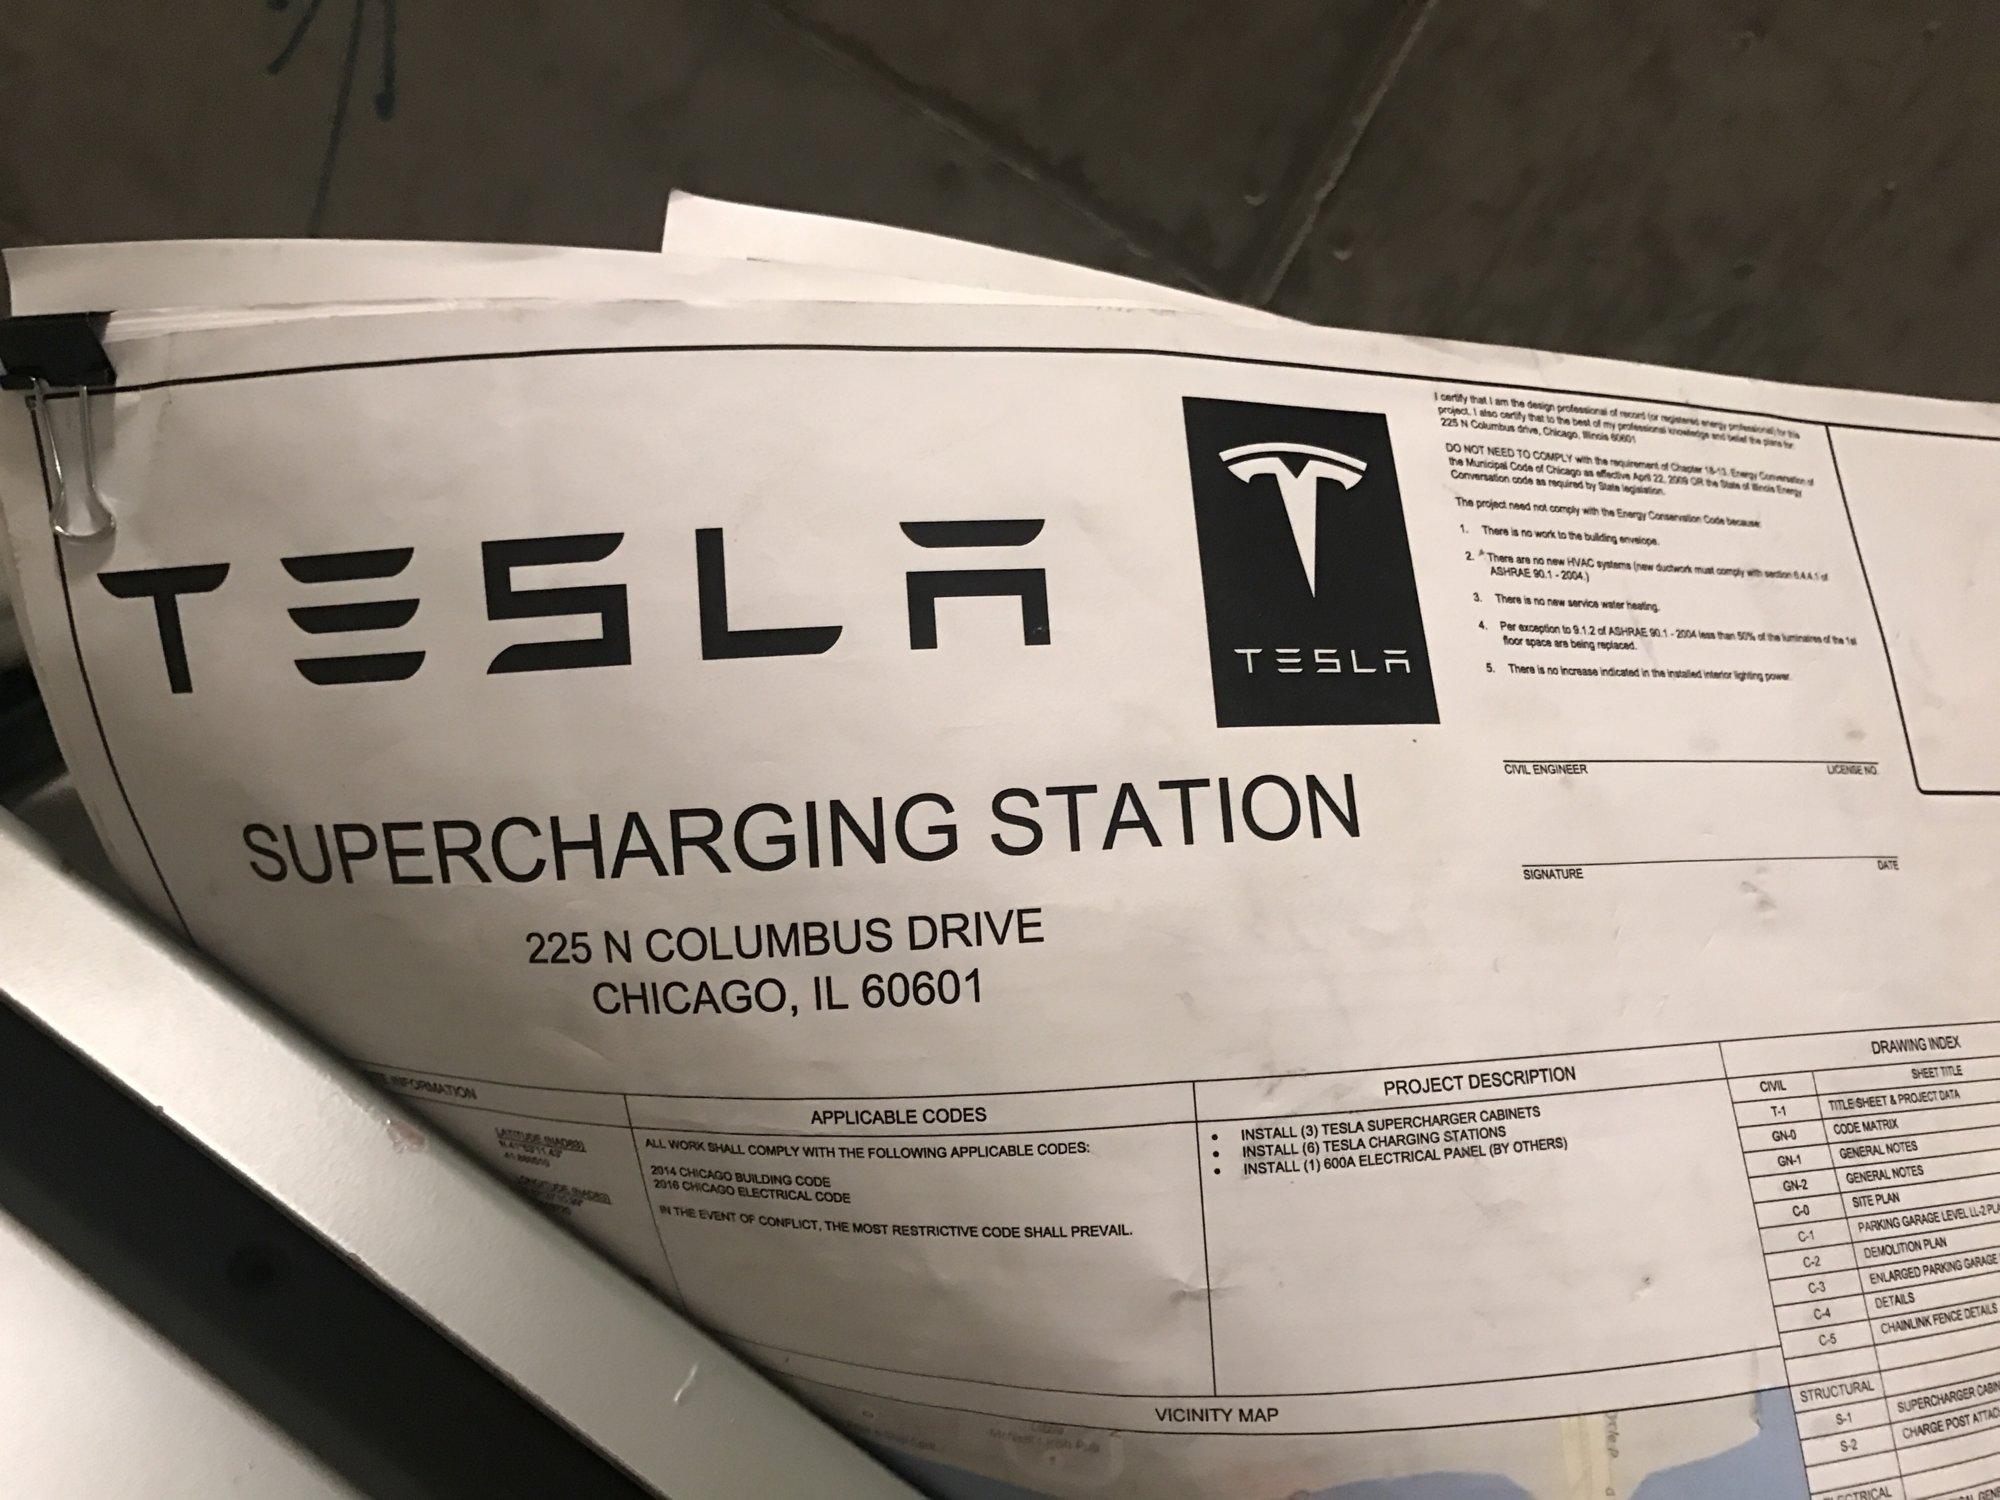 supercharger plans.jpg